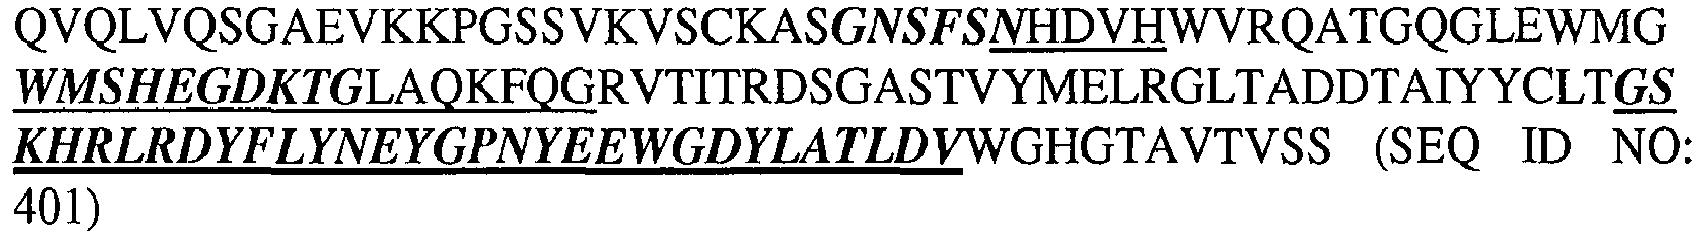 Figure imgb0290